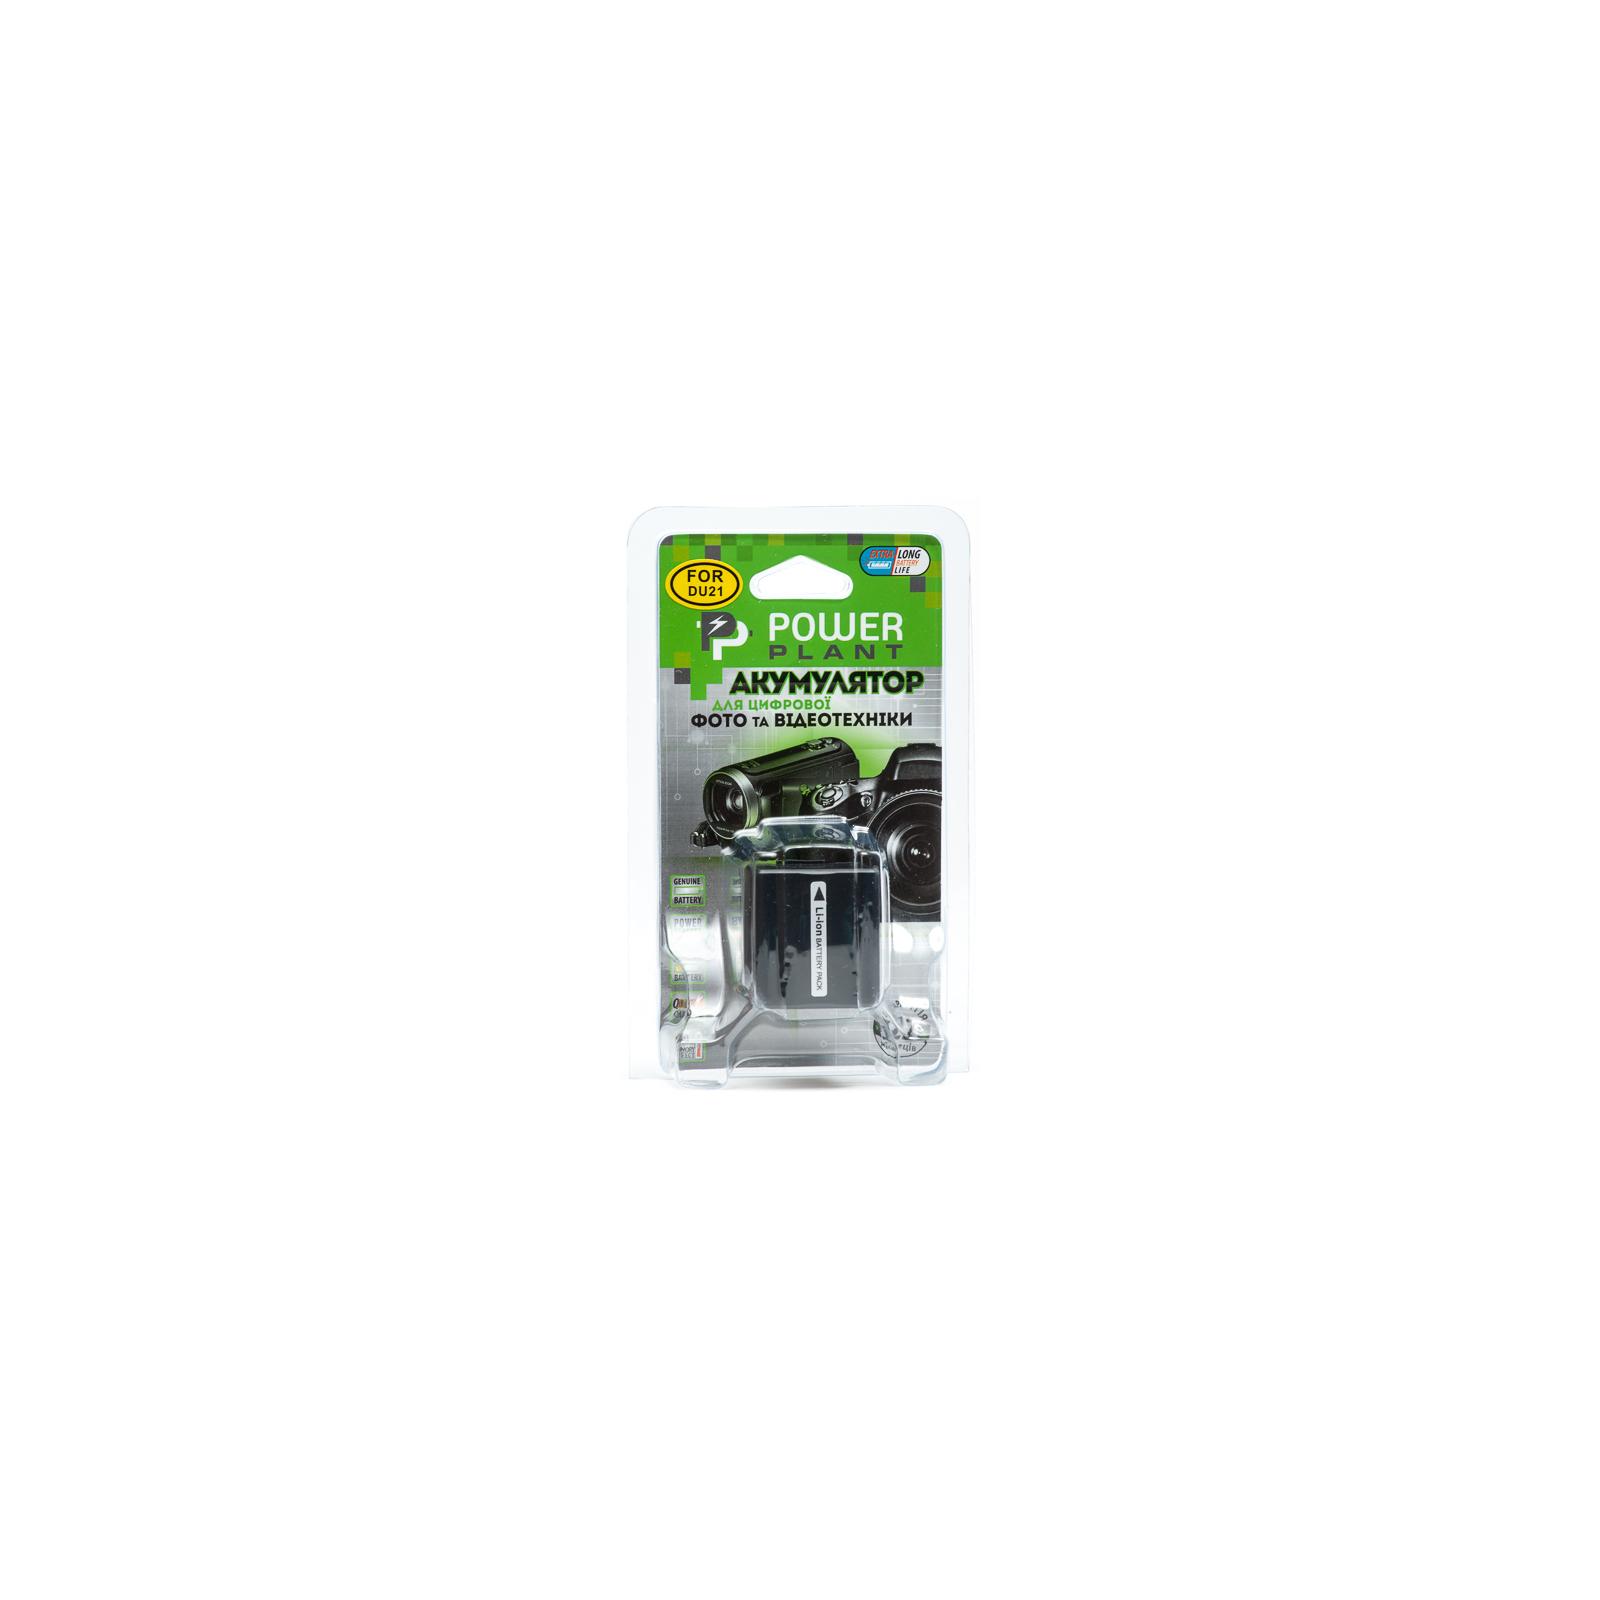 Аккумулятор к фото/видео PowerPlant Panasonic VBD210, CGA-DU21 (DV00DV1092) изображение 3